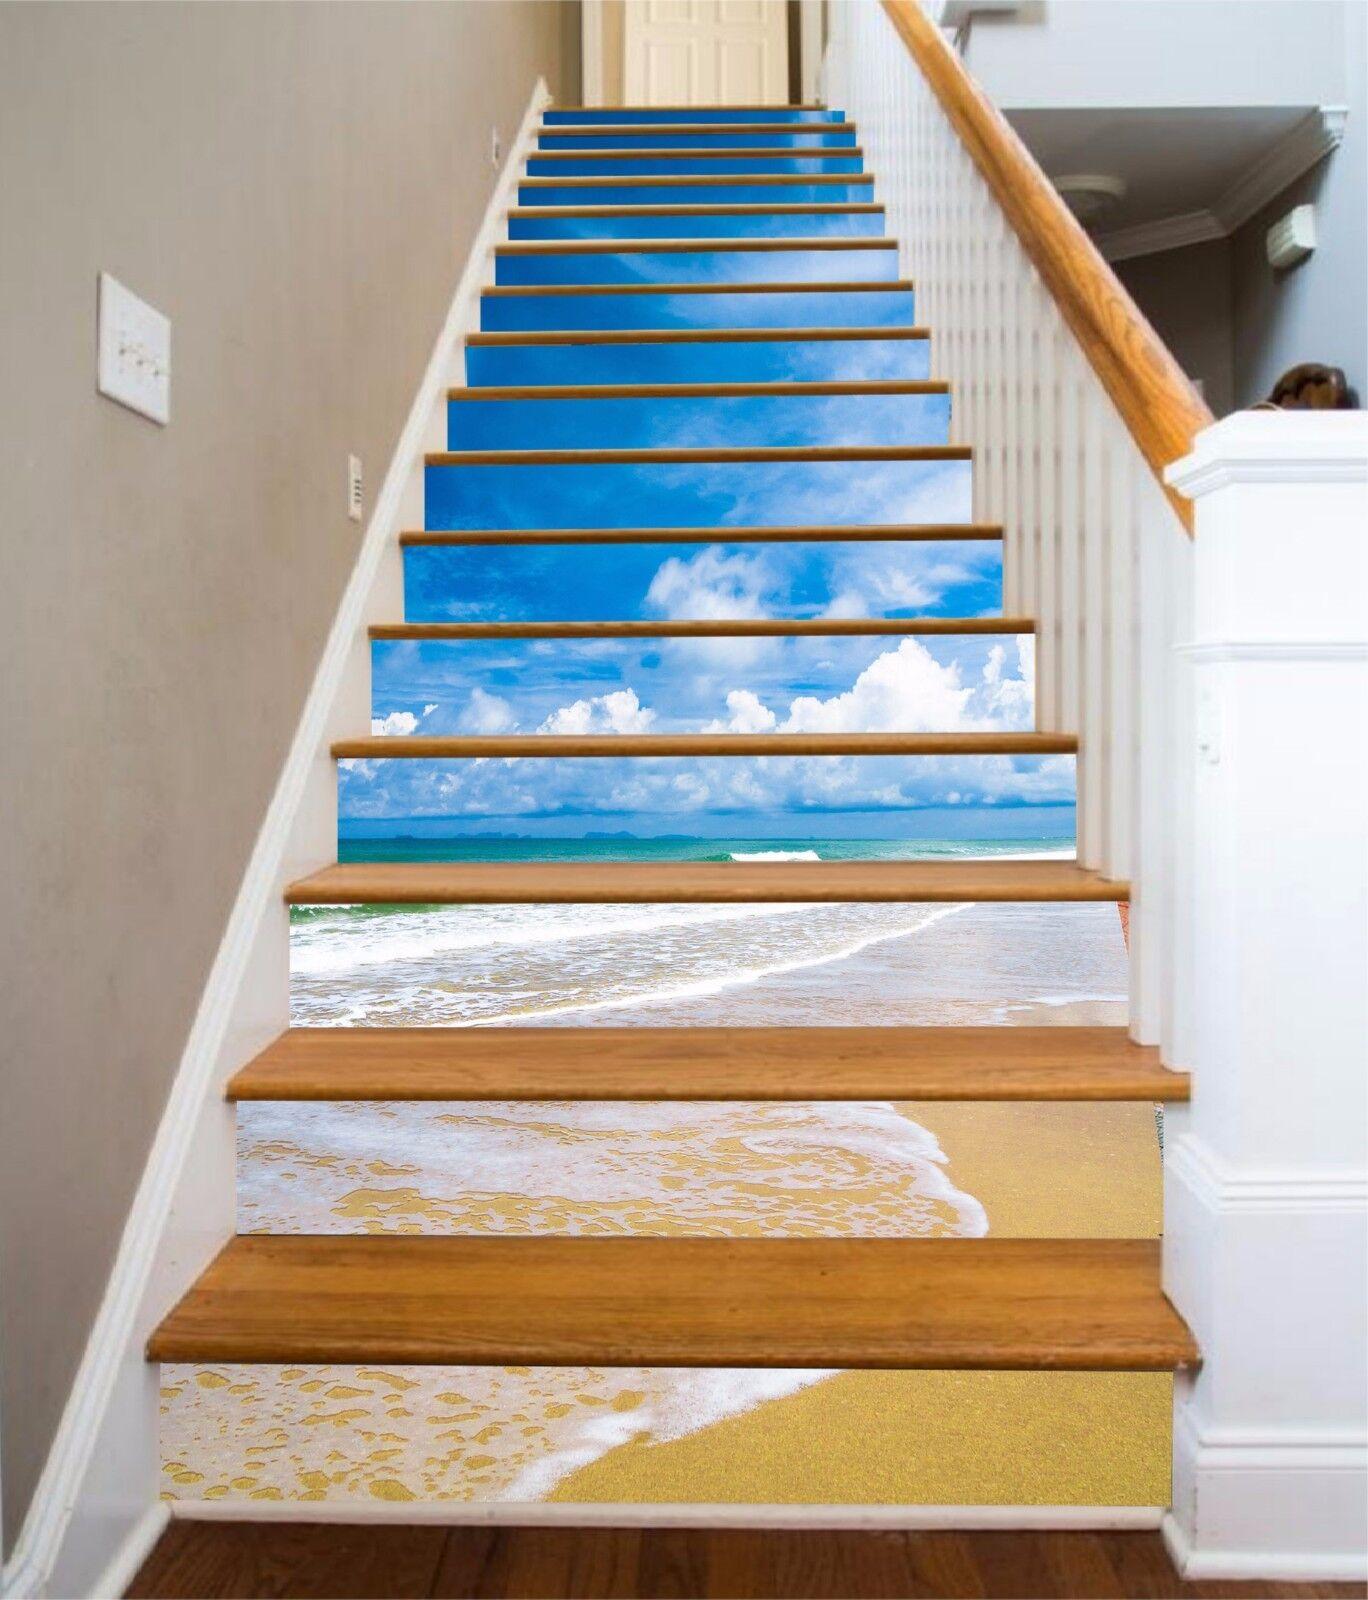 3D Blau sky beach 23 Risers Decoration Photo Mural Vinyl Decal WandPapier US